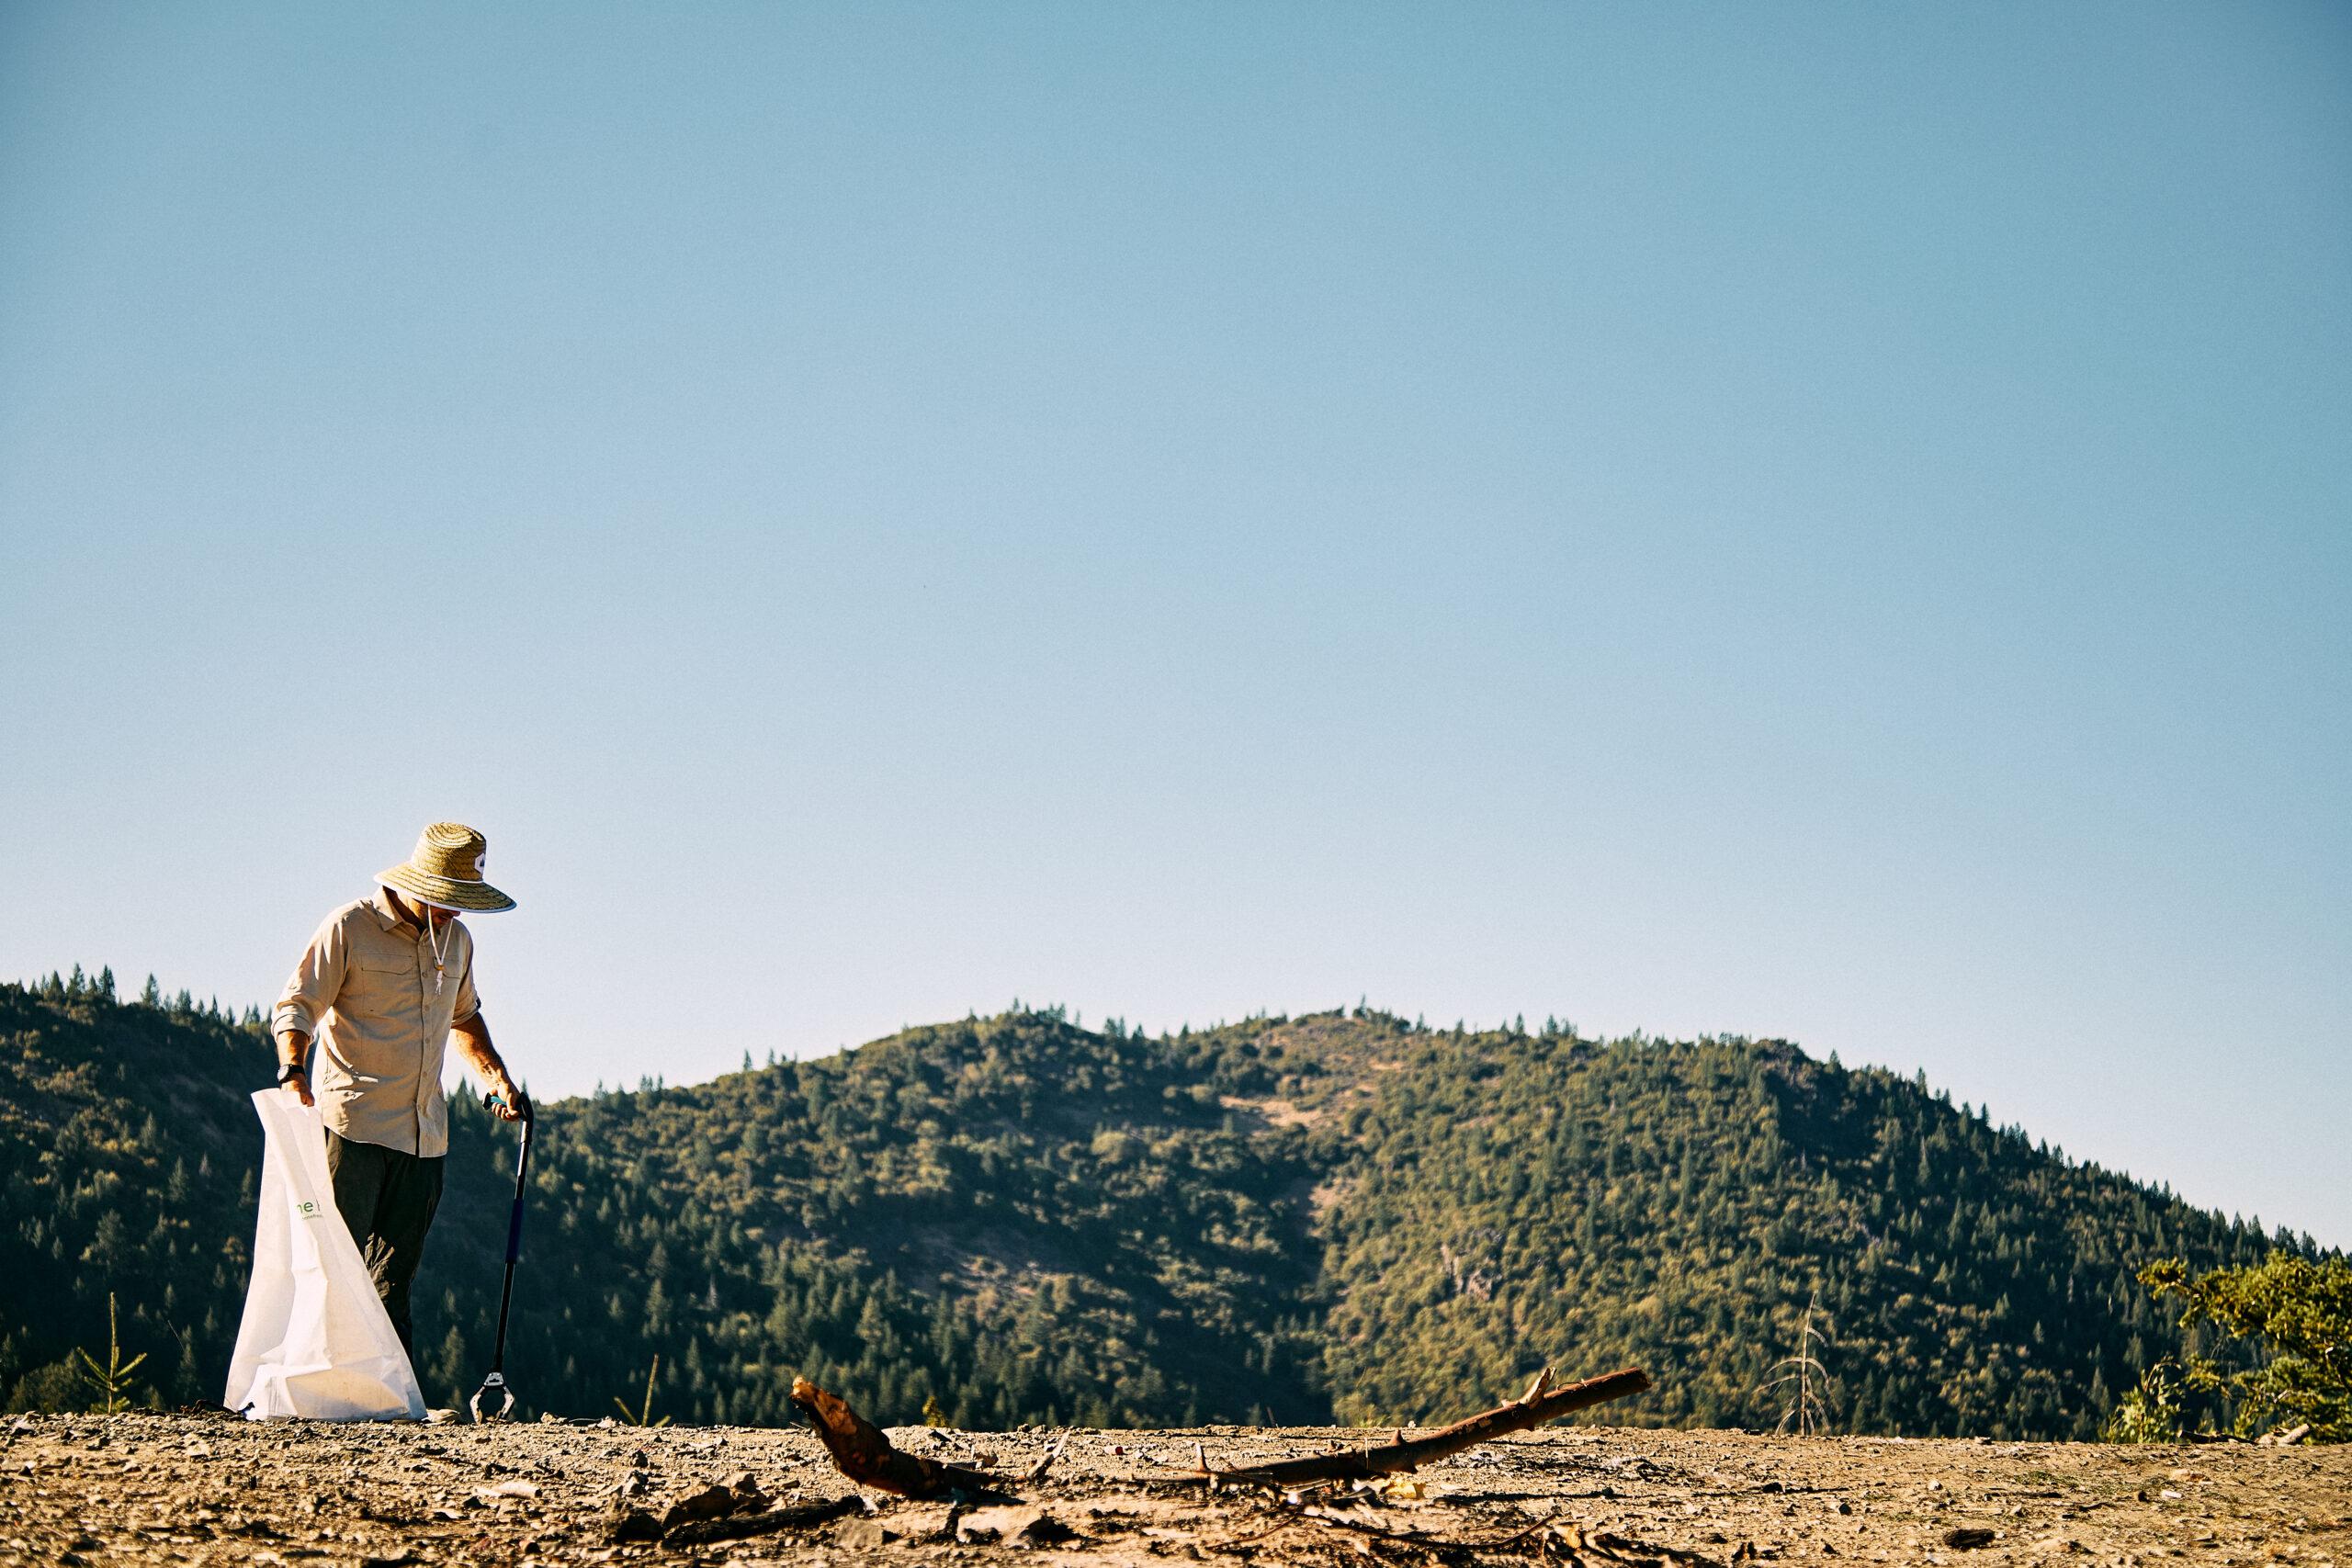 Scottsdale Brand Lifestyle Photography - Environmental Efforts Picking Up Trash